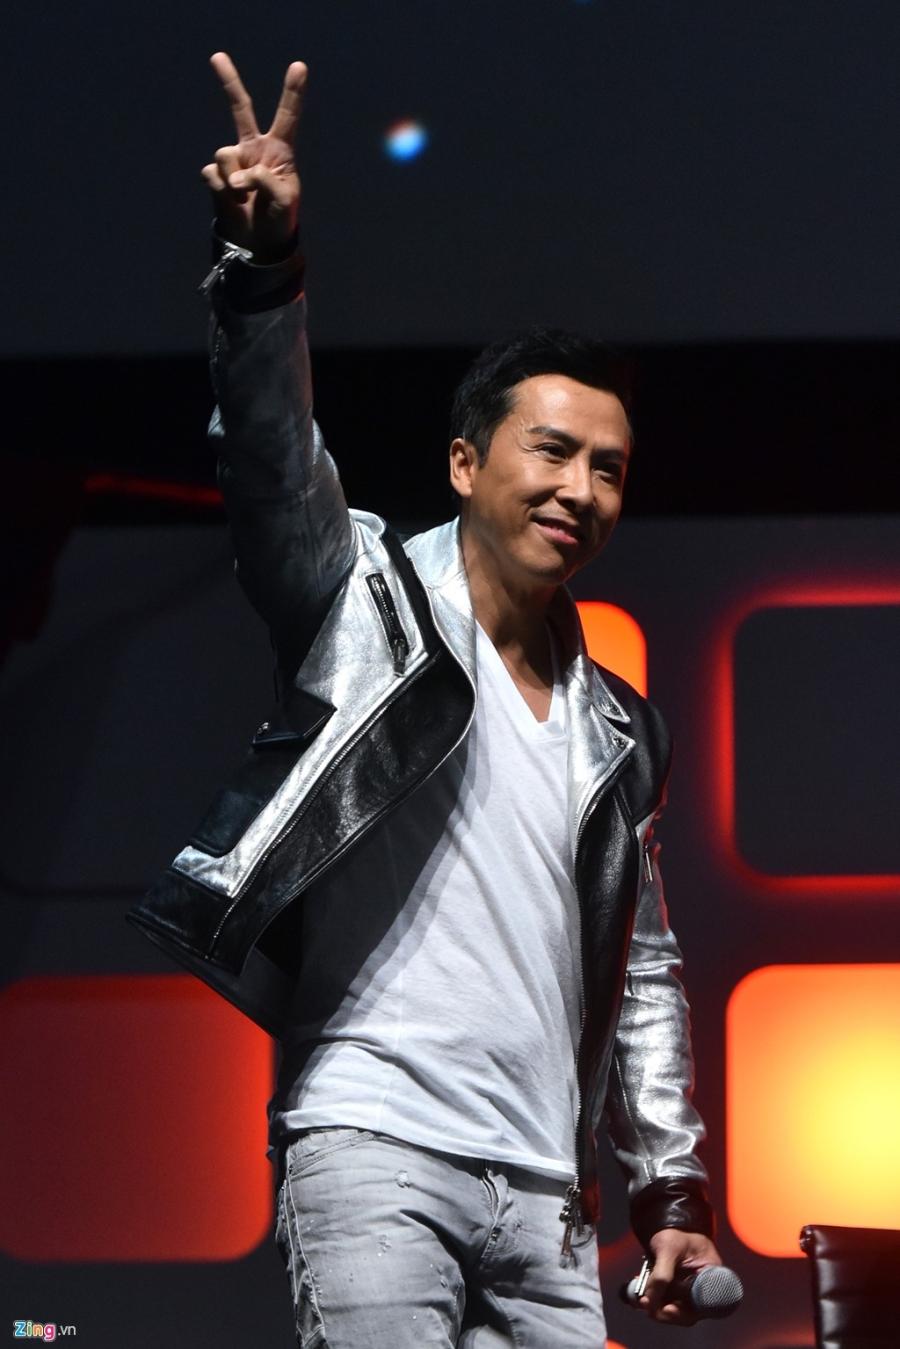 Chan Tu Dan co the chi dong mot phim 'Star Wars' duy nhat hinh anh 2